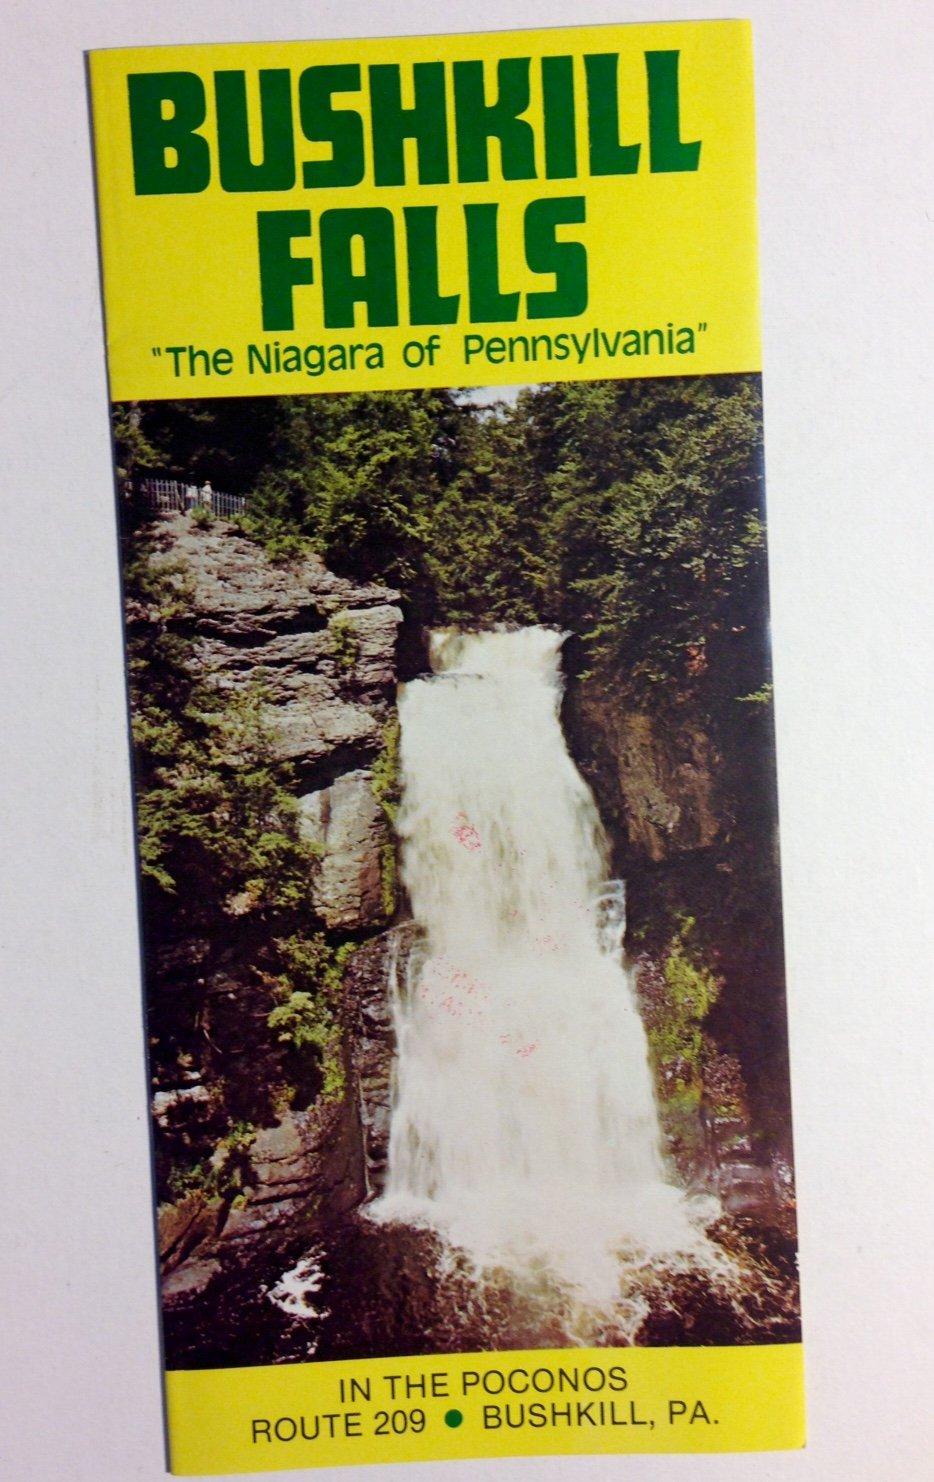 Amazon.com: Vintage Original Brochure Bushkill Falls Poconos ... on route 11 pa map, route 33 pa map, route 220 pa map, route 611 pa map, route 100 pa map, route 83 pa map, route 309 pa map, route 29 pa map, route 82 pa map, route 51 pa map, route 15 pa map, route 23 pa map,